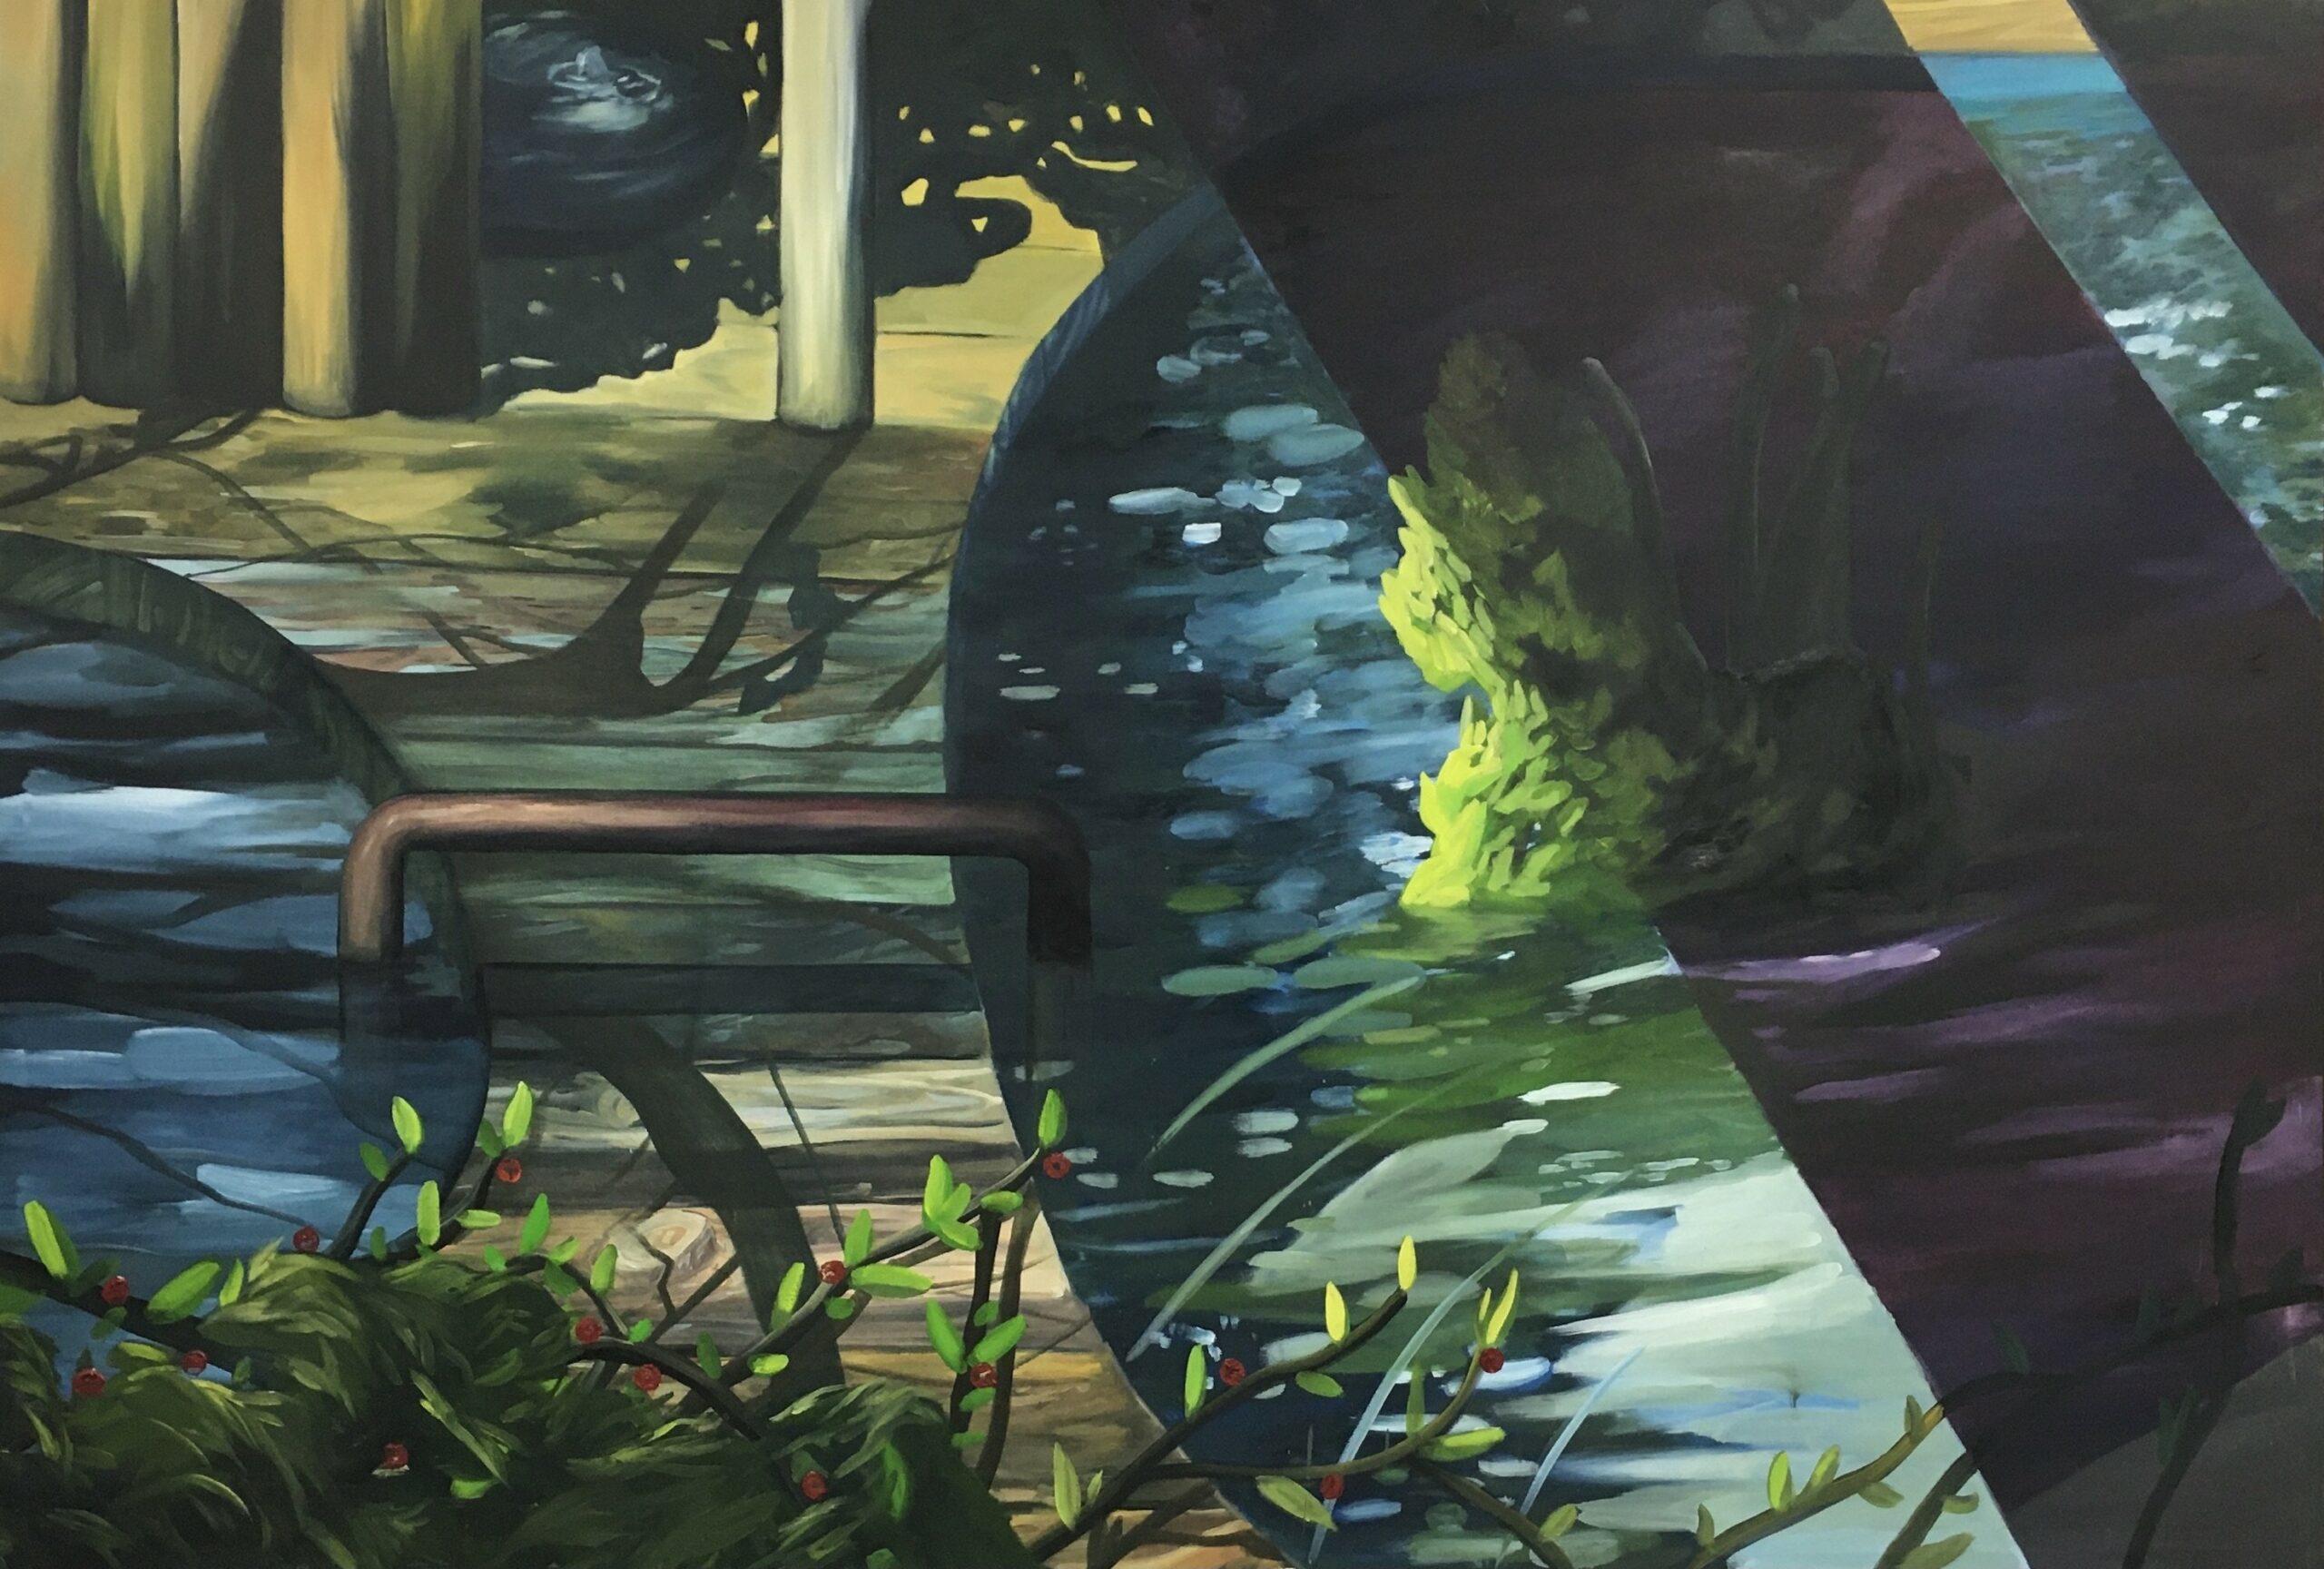 Ernesto Gutierrez Moya, The Pond (panel 1 of 6), 2020